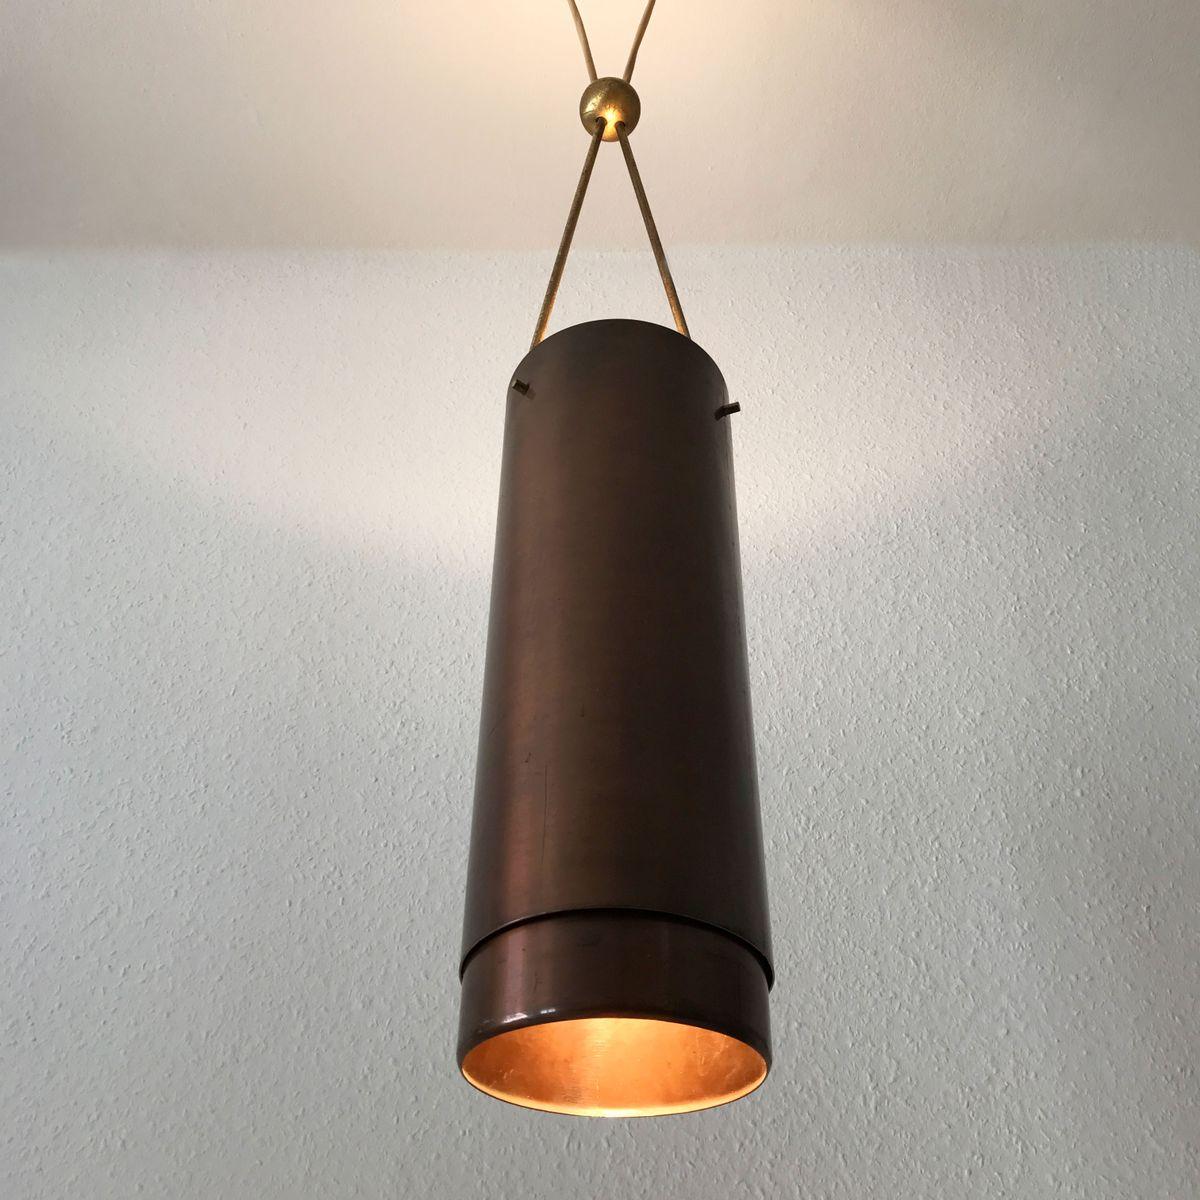 mid century modern cylindrical pendant light 1950s for. Black Bedroom Furniture Sets. Home Design Ideas